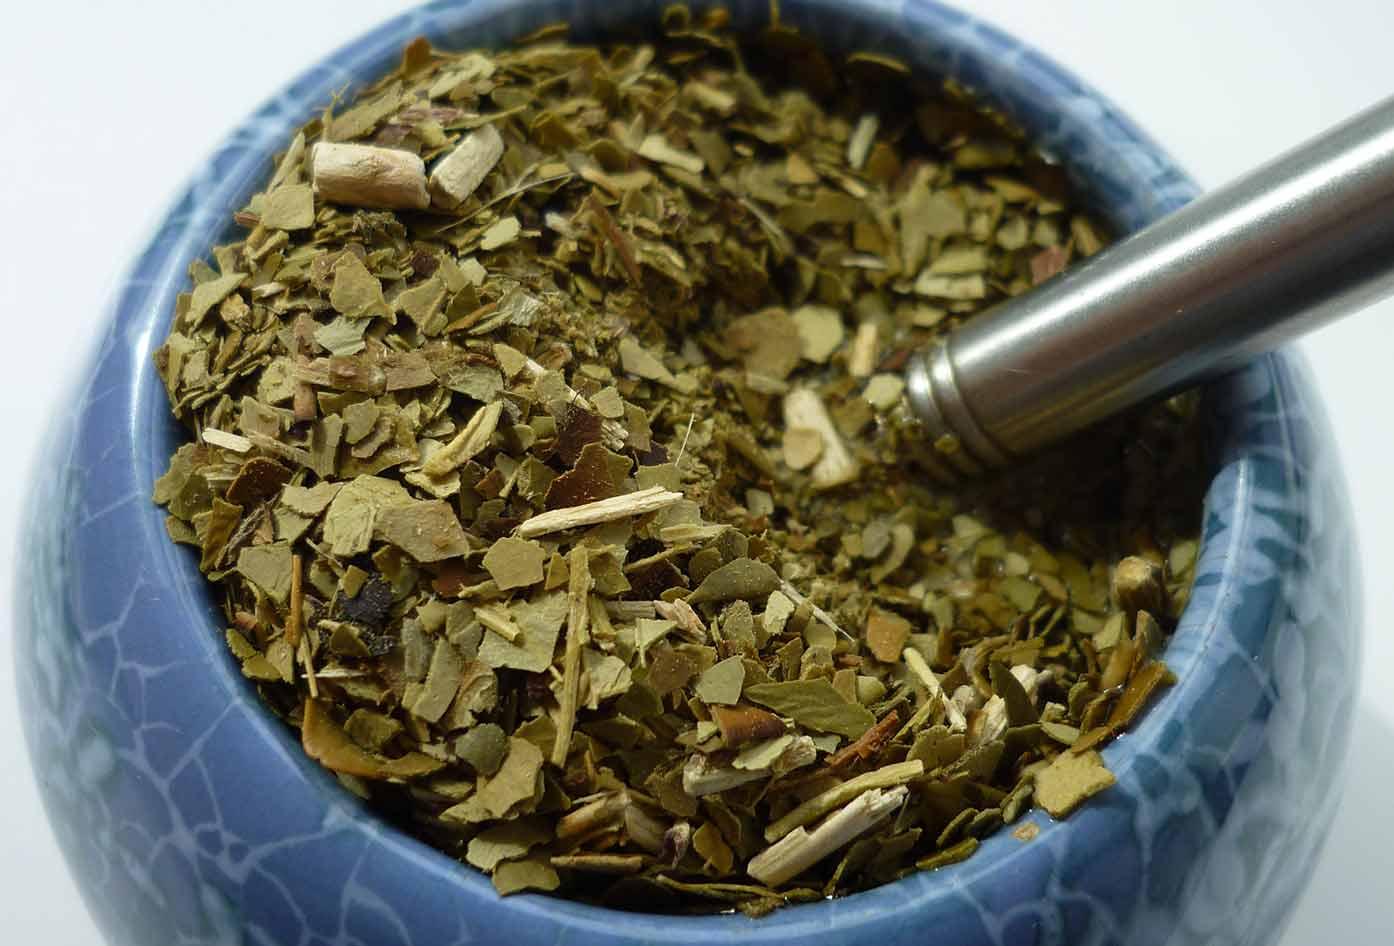 yerba mate leaves